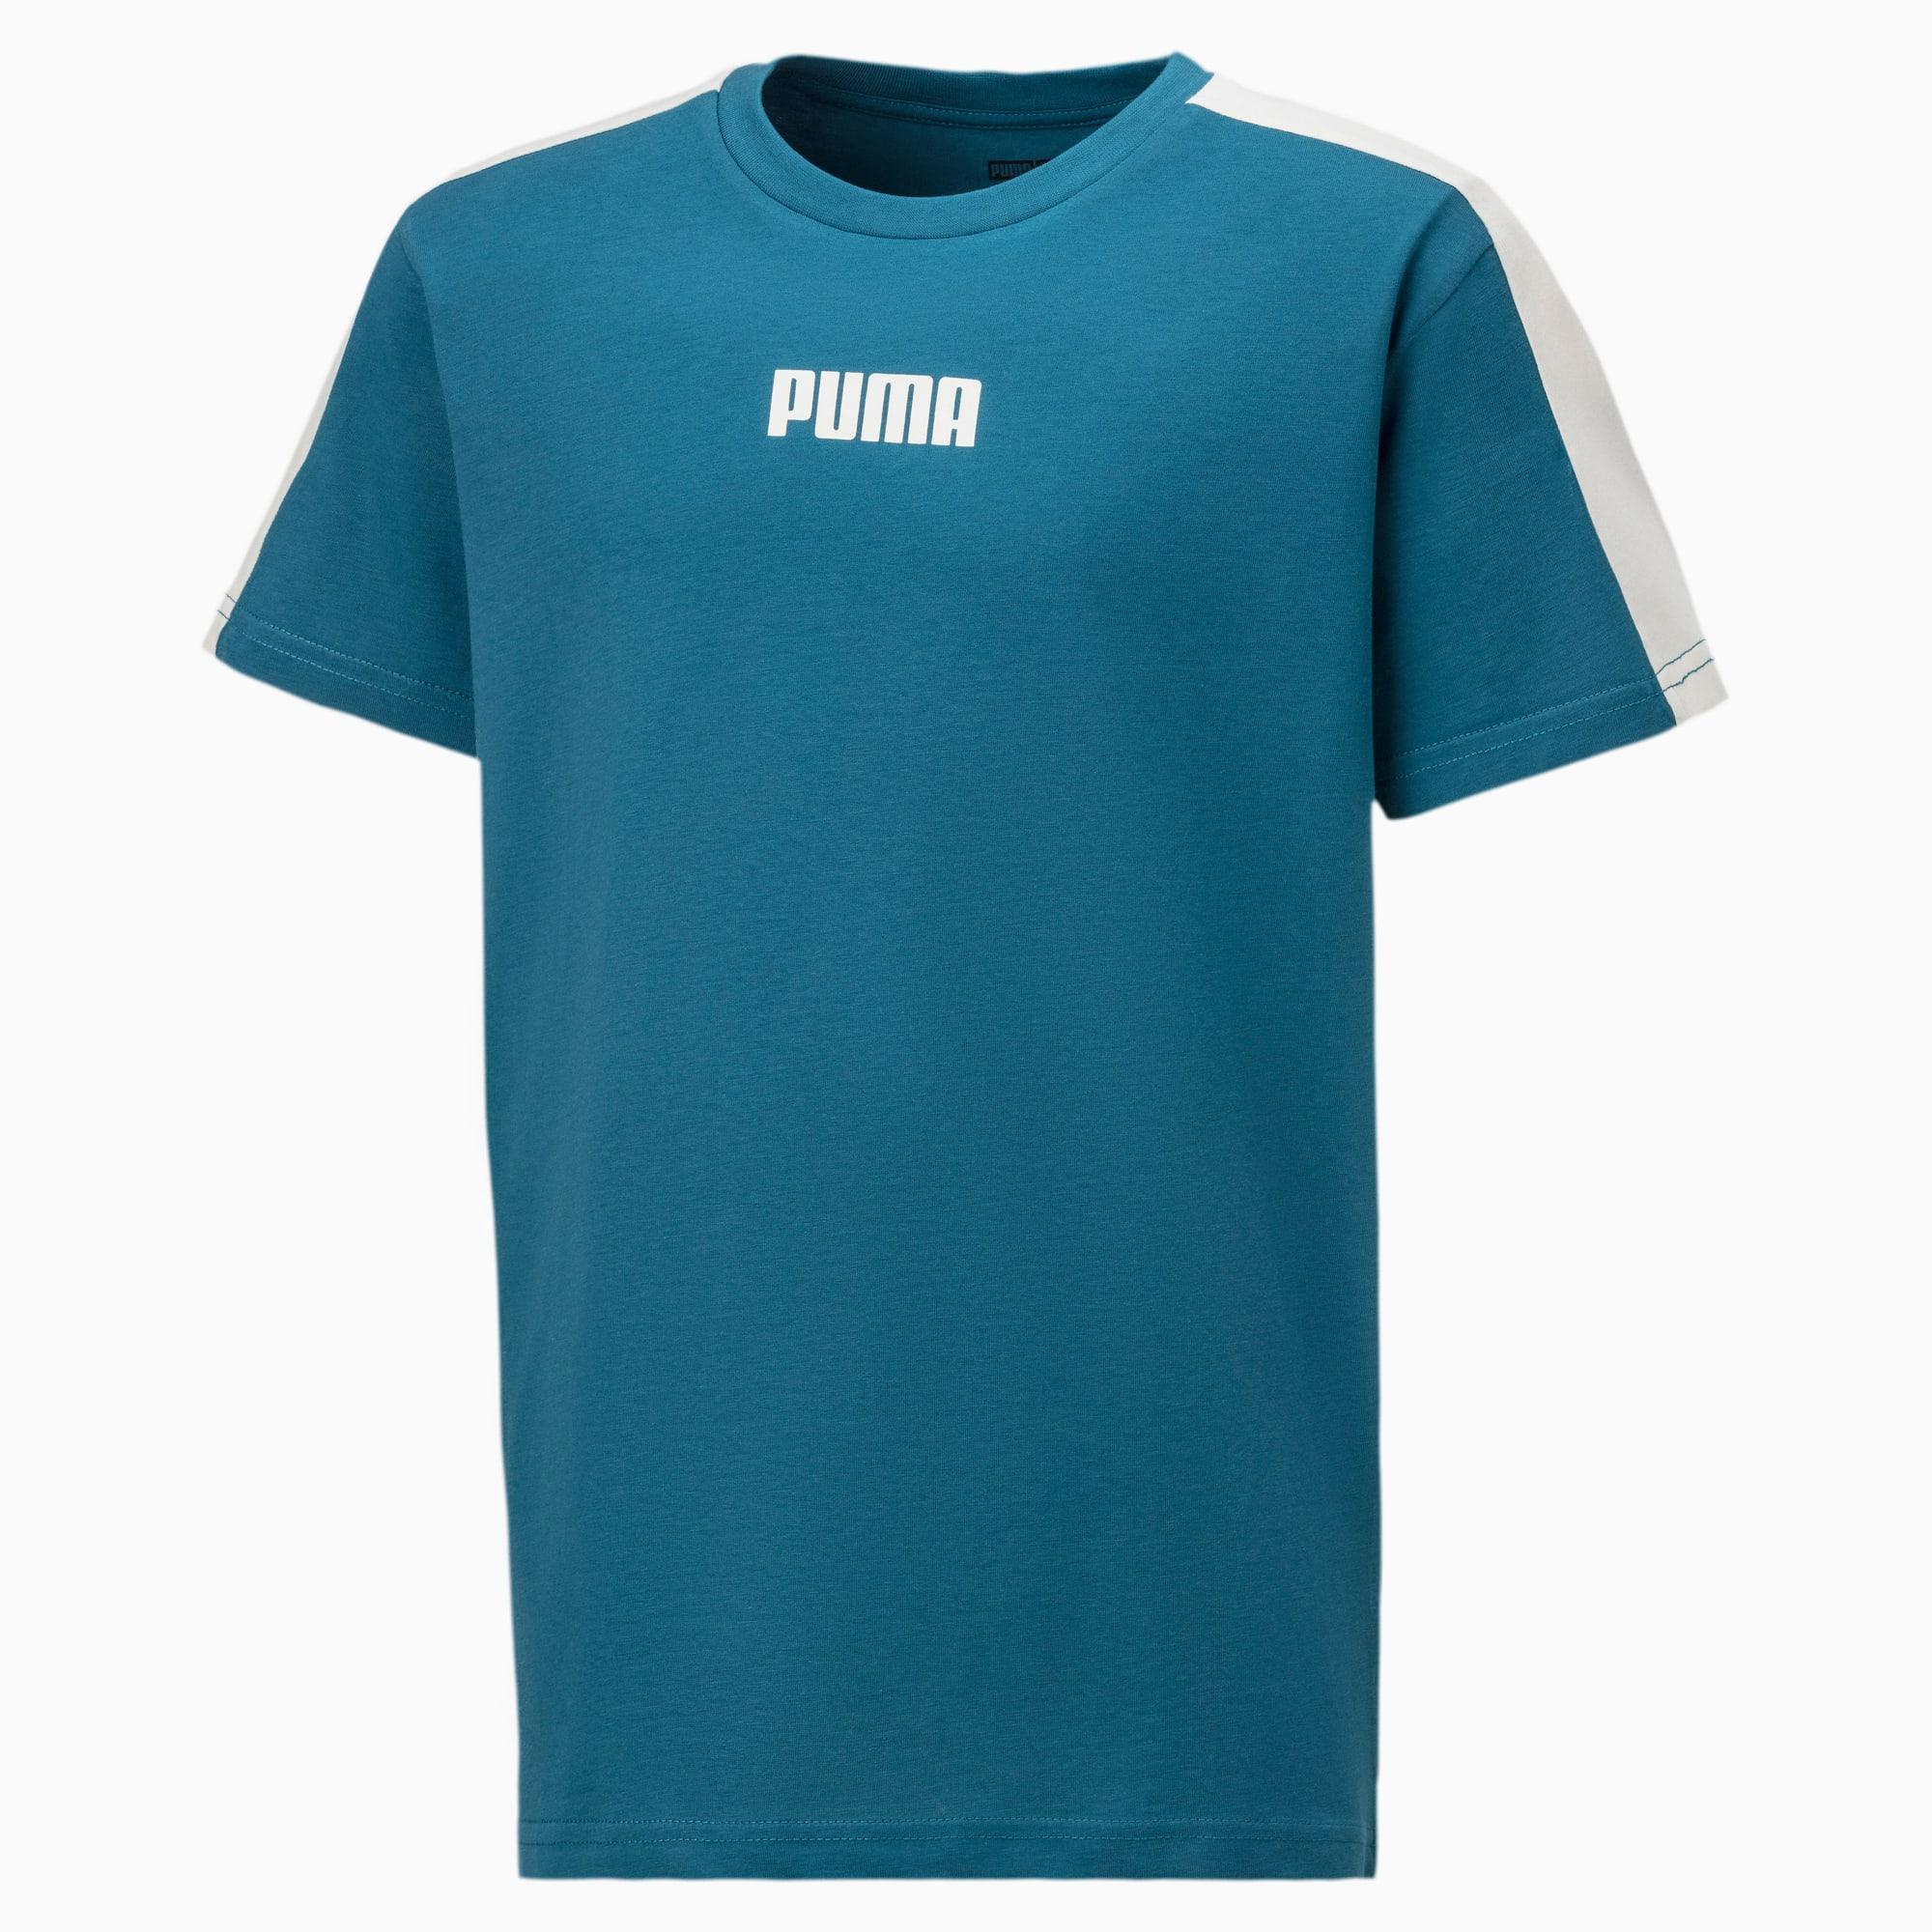 PUMA Logo Kinder T-Shirt   Mit Aucun   Blau